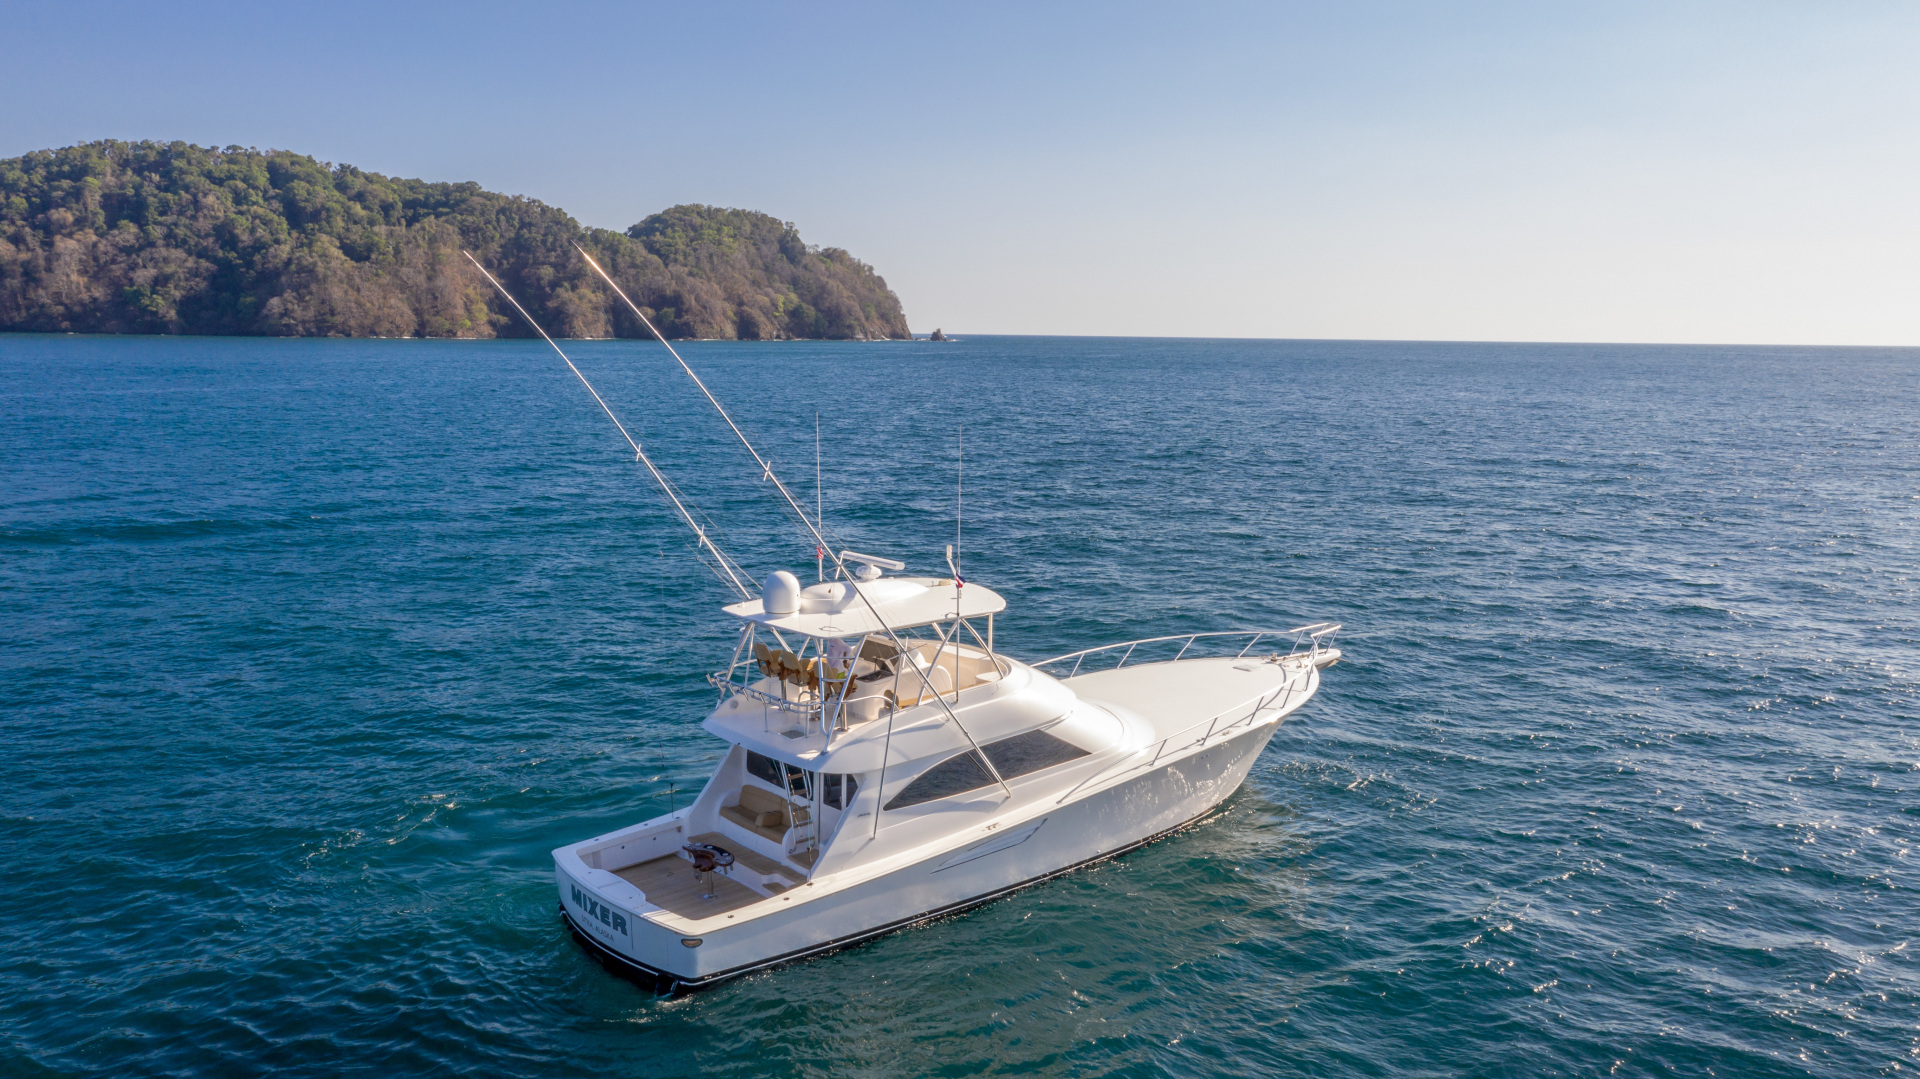 Viking-62 Convertible 2014-Mixer Playa Herradura, Los Suenos,-Costa Rica-2014 Viking 62 Convertible  Starboard Profile-1356264 | Thumbnail